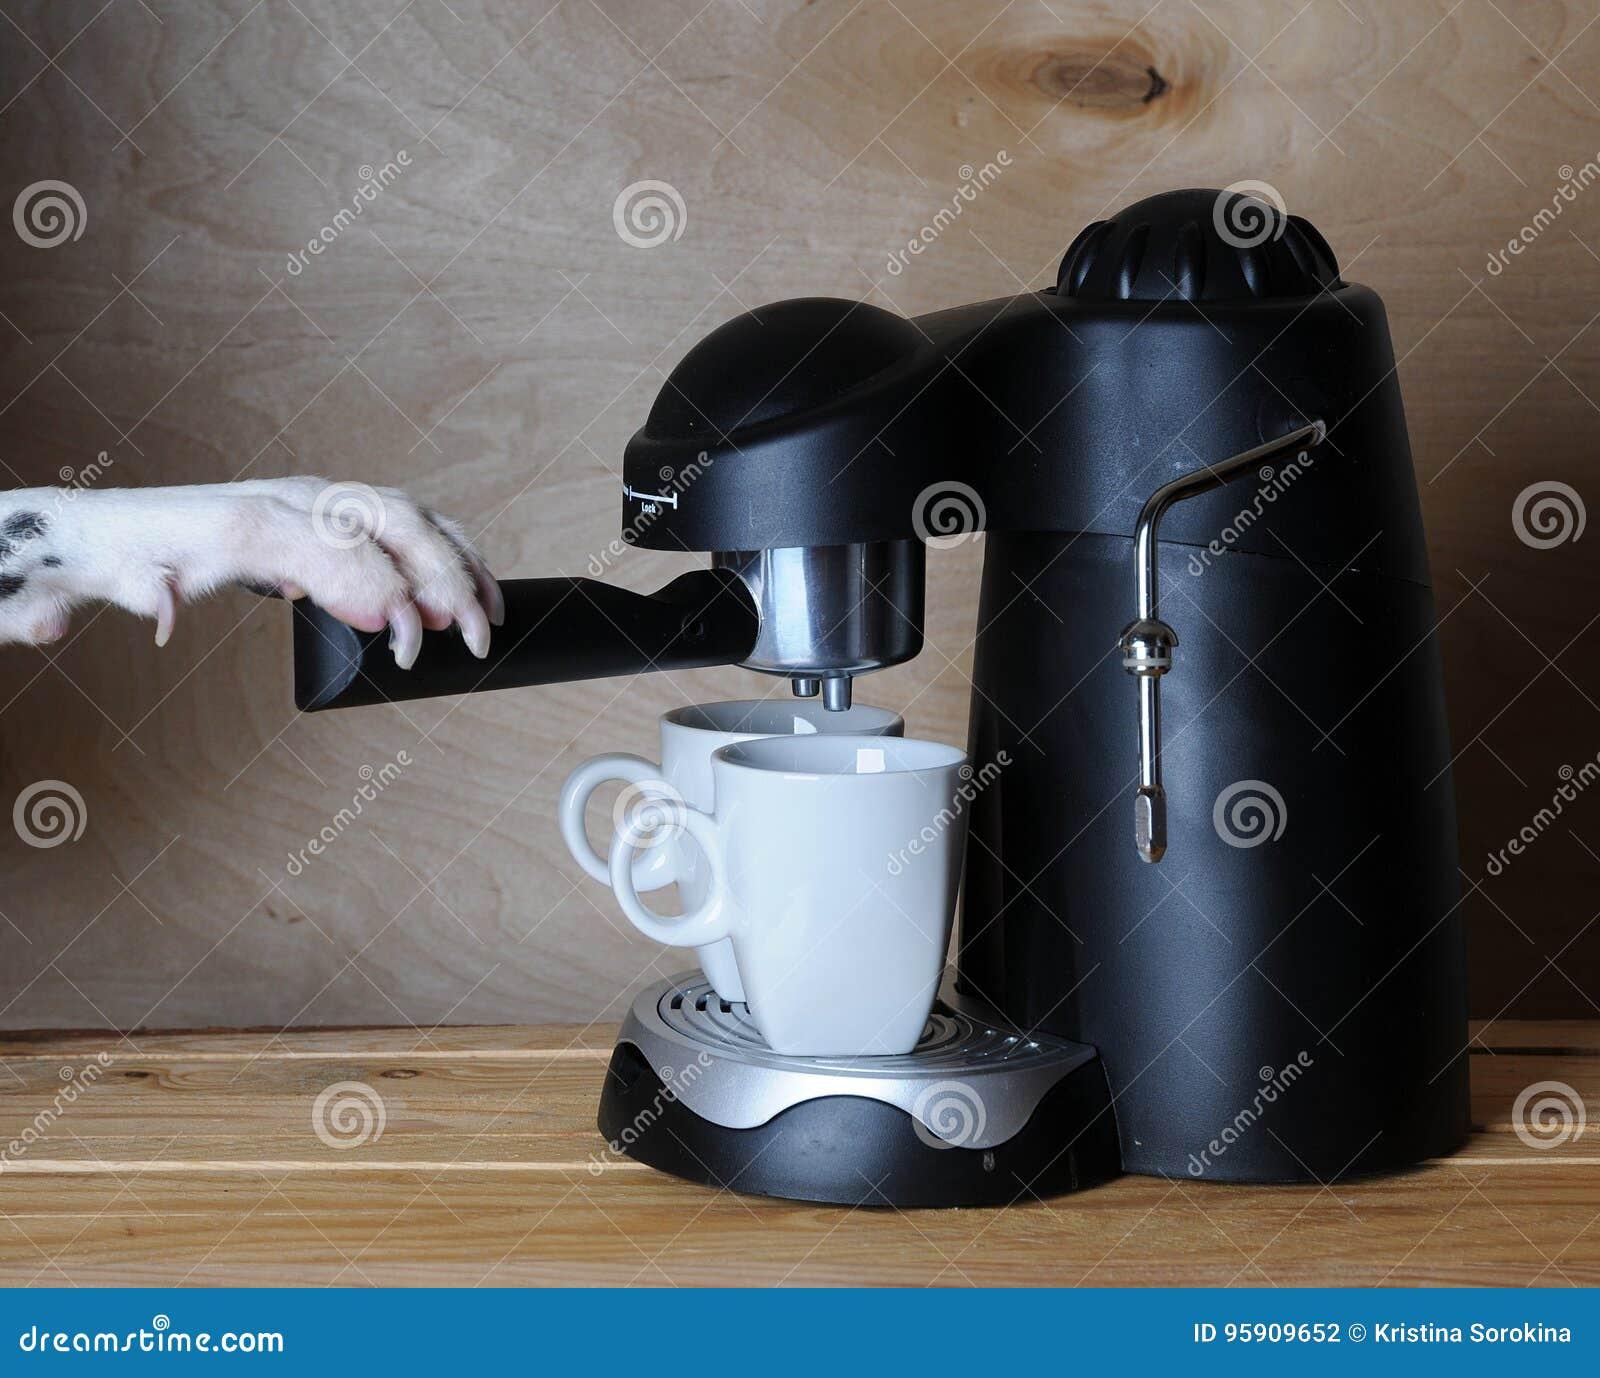 Dalmatian barista prepares coffee. Dog& x27;s paw on the handle of the espresso machine.